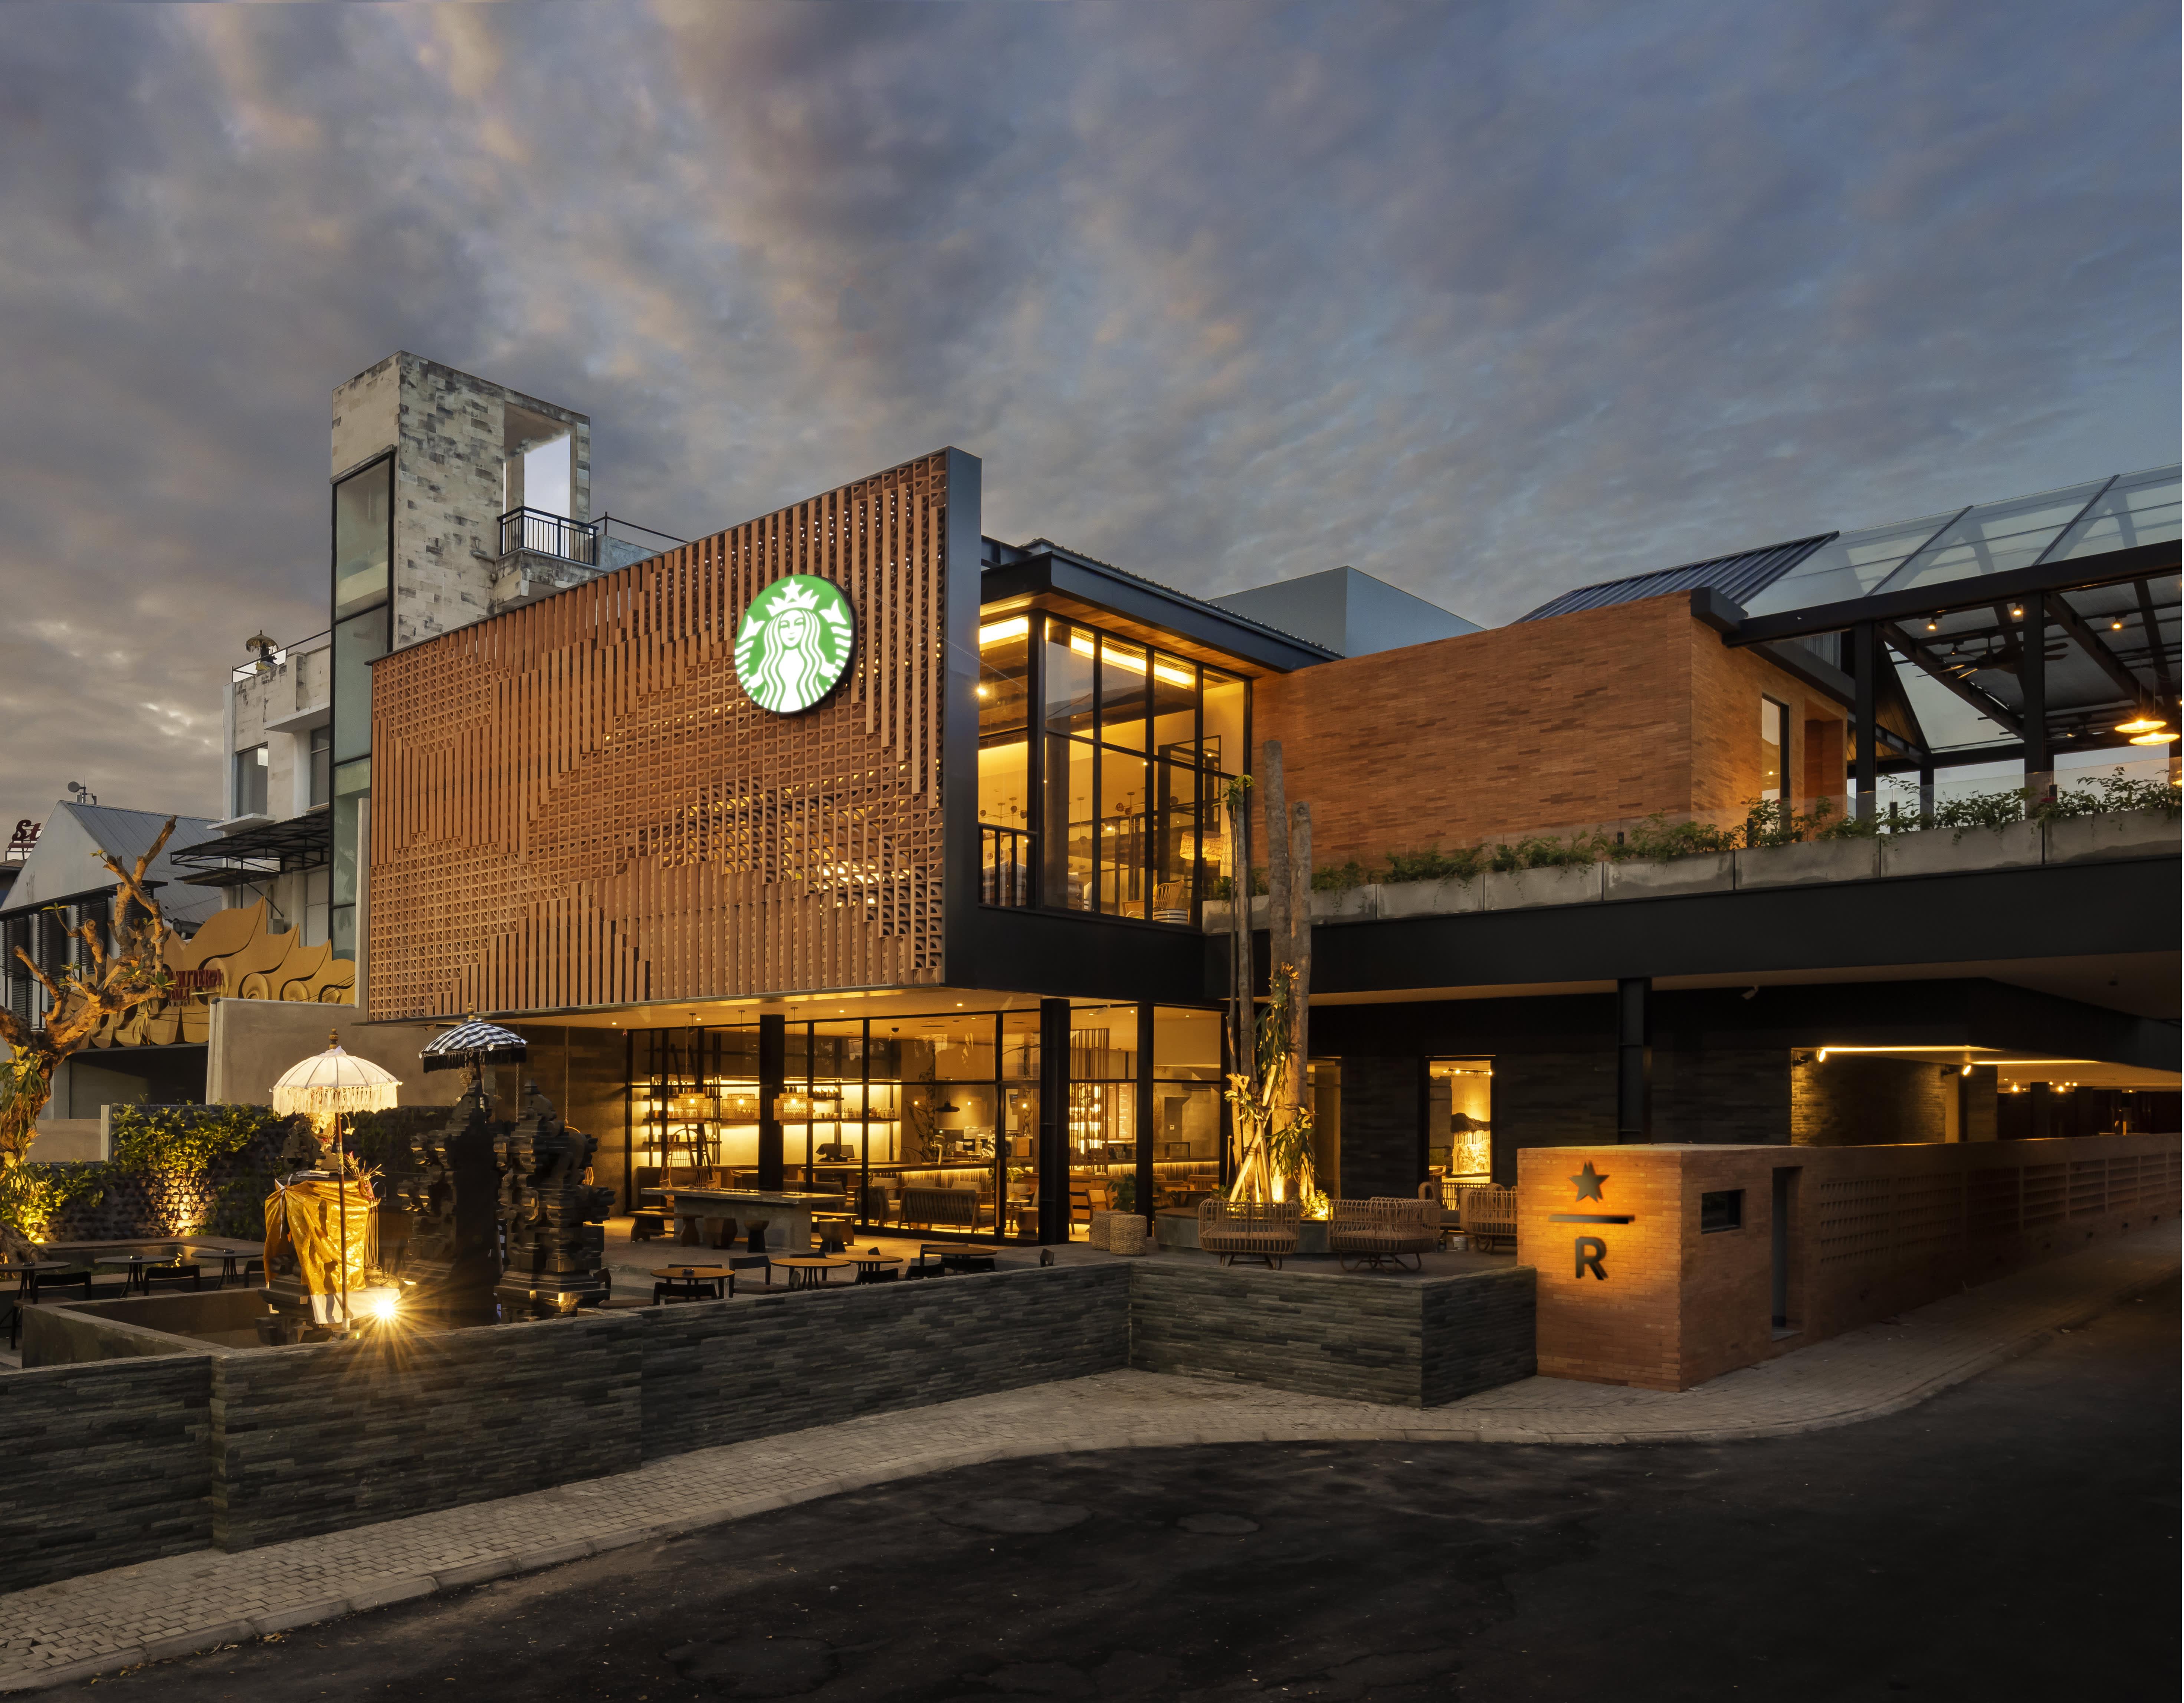 Starbucks Reserve Dewata in Bali, Indonesia has coffee ...